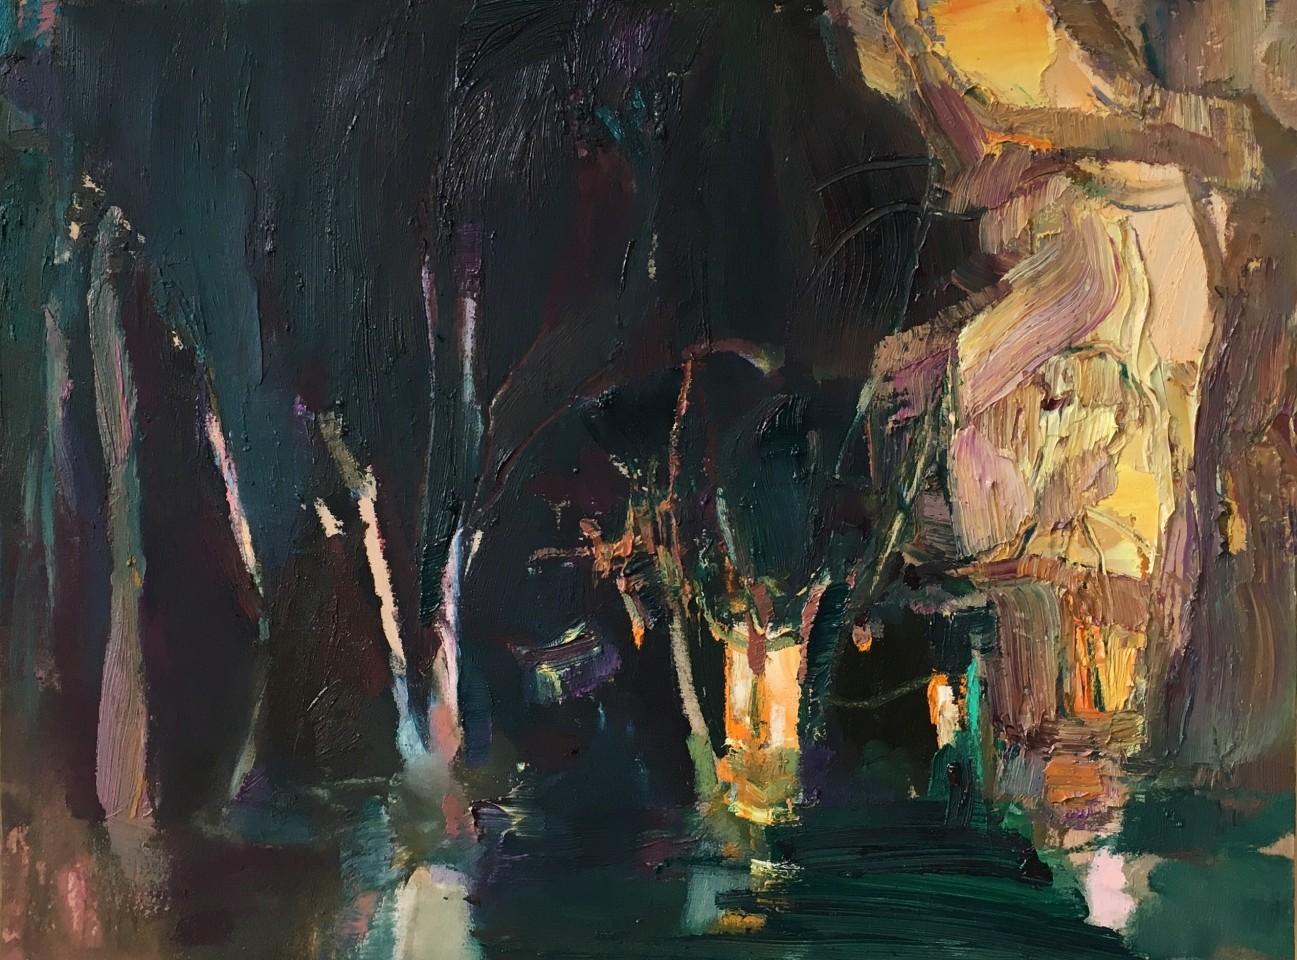 Beth Fletcher, Memento (Flood Light)